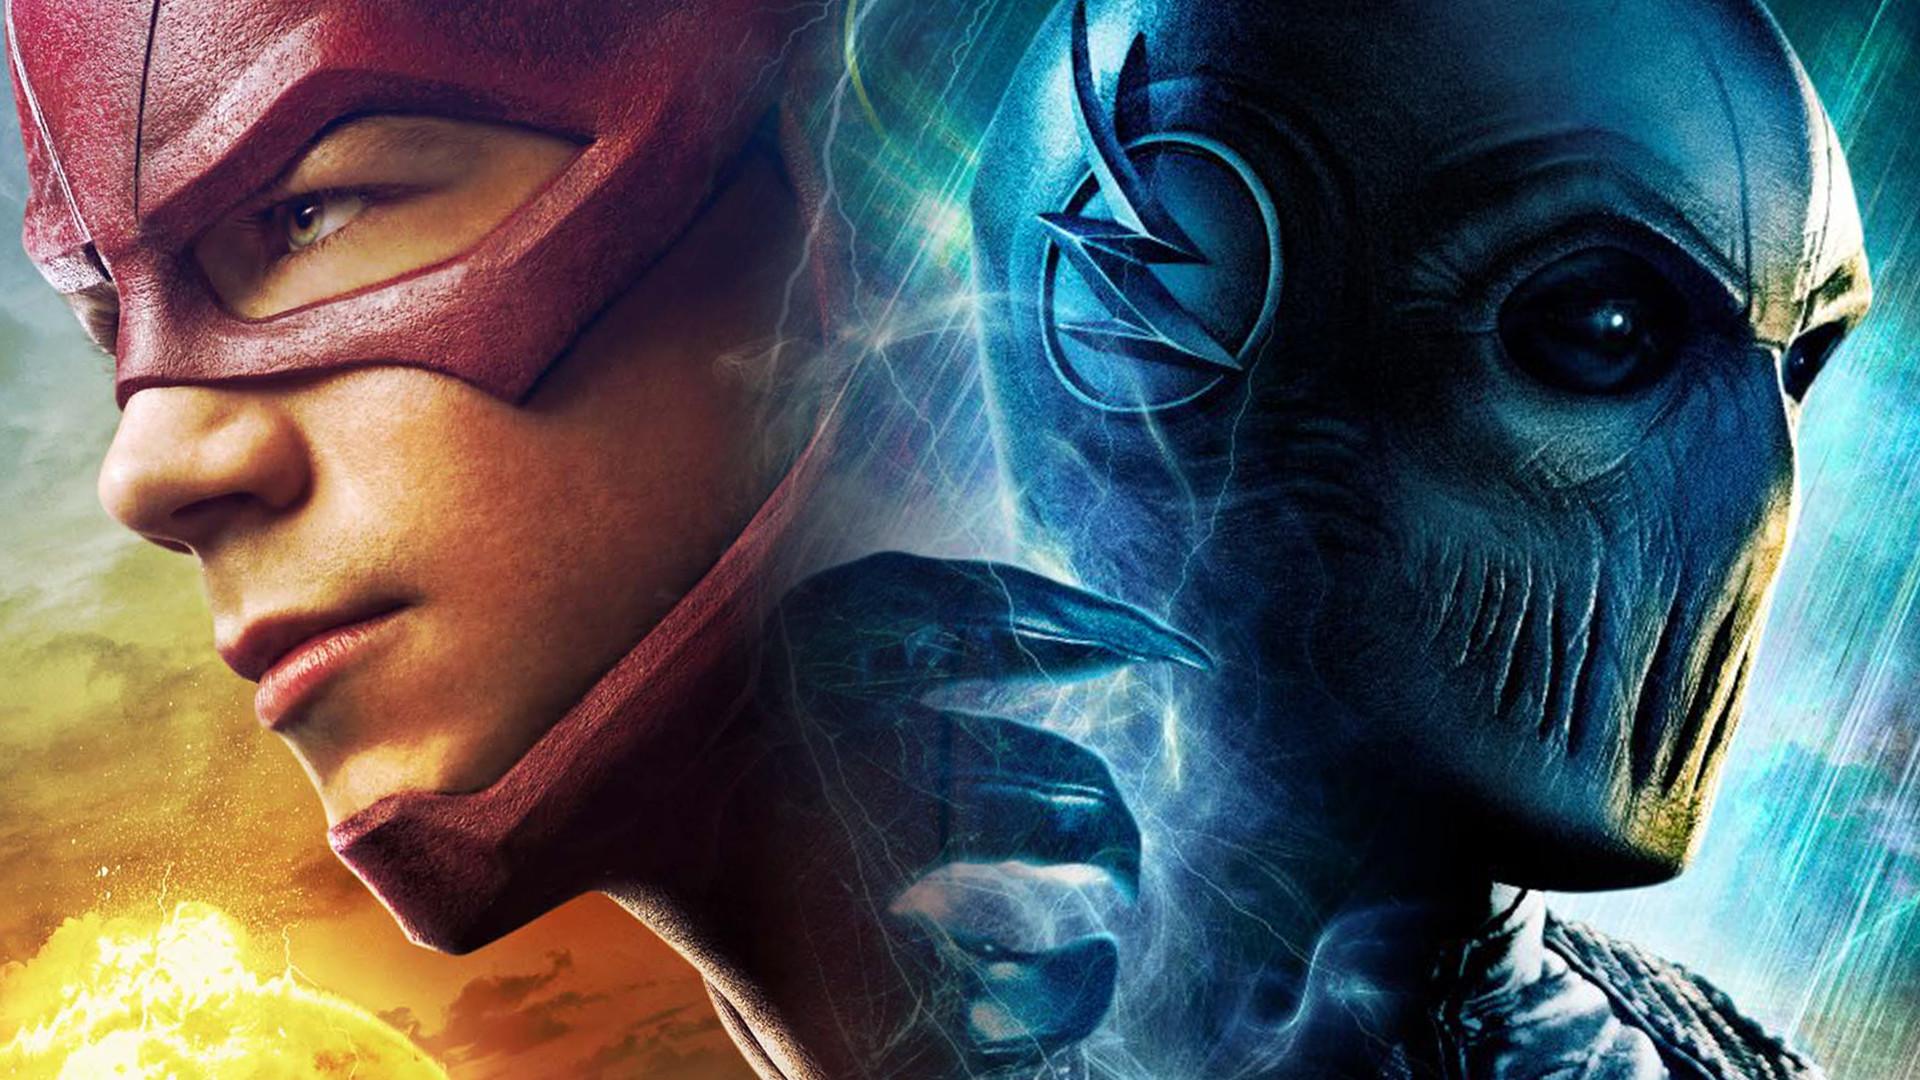 Custom The Flash/Zoom Wallpaper!